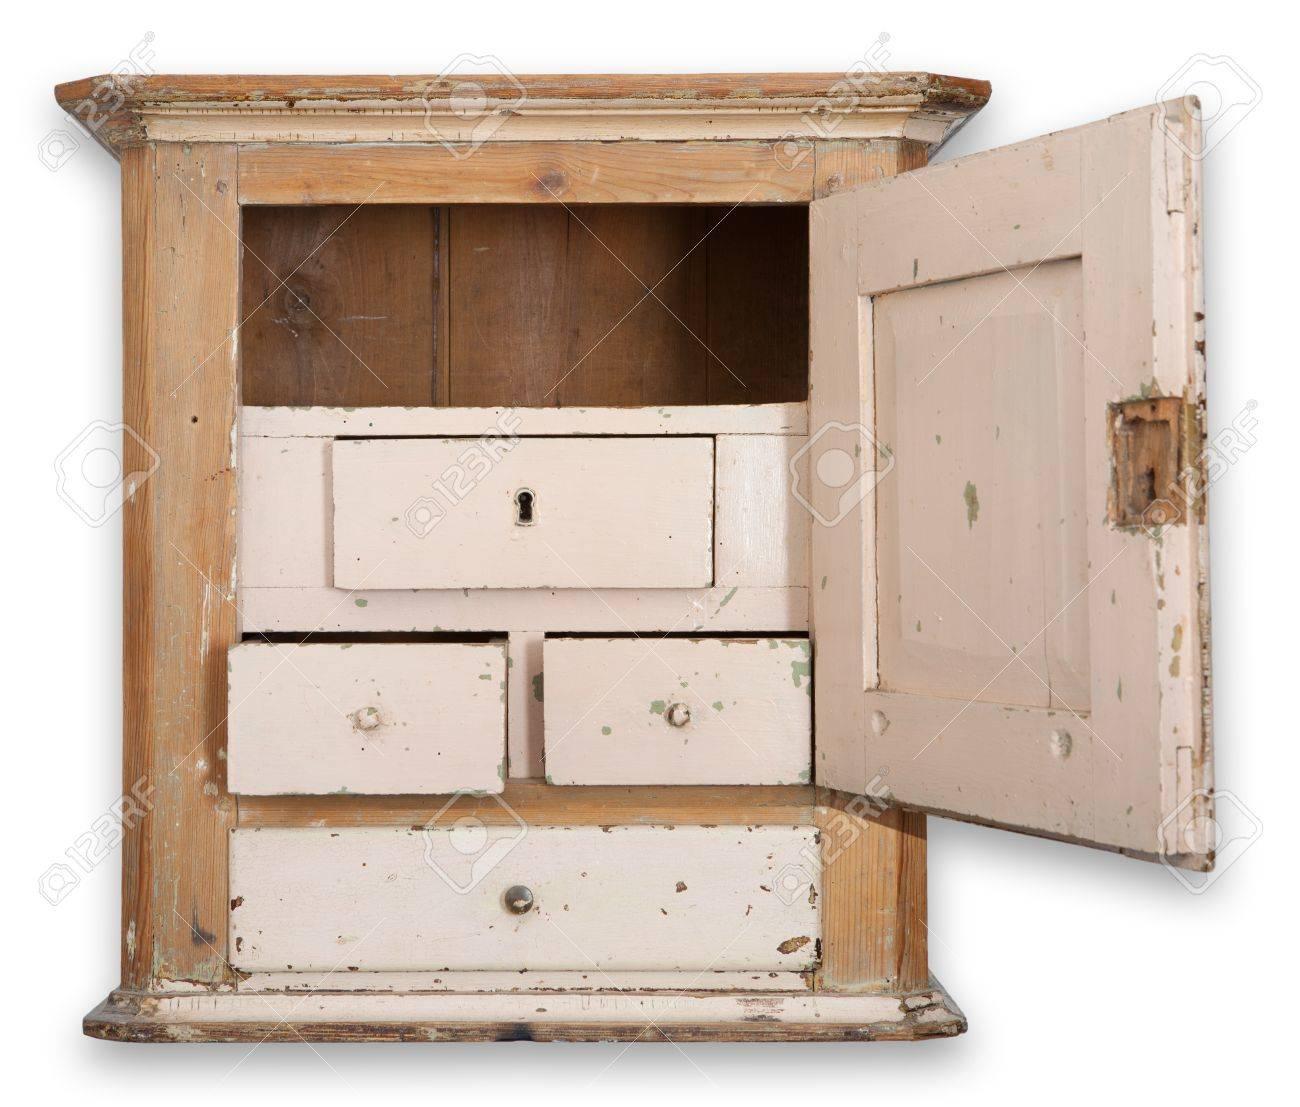 armadio o armadio a muro. mobili antichi in legno. tradizionale ... - Armadio In Legno Tradizionale